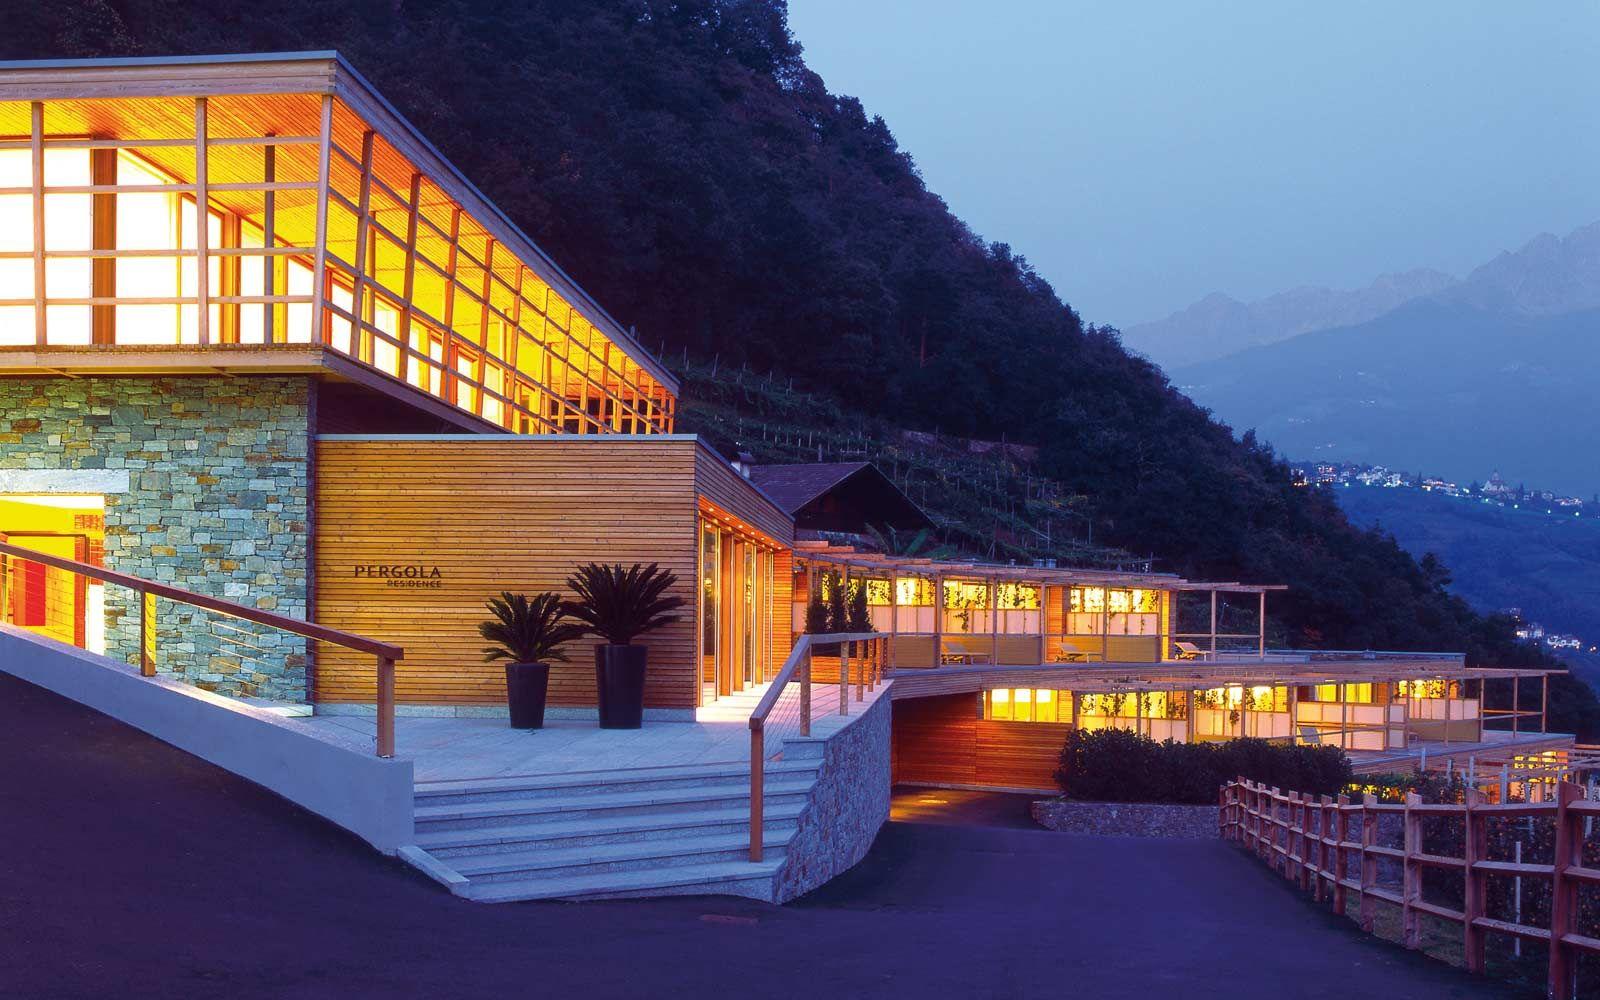 Pergola South Tyrol, Italy Hotel südtirol, Meran, Pergola